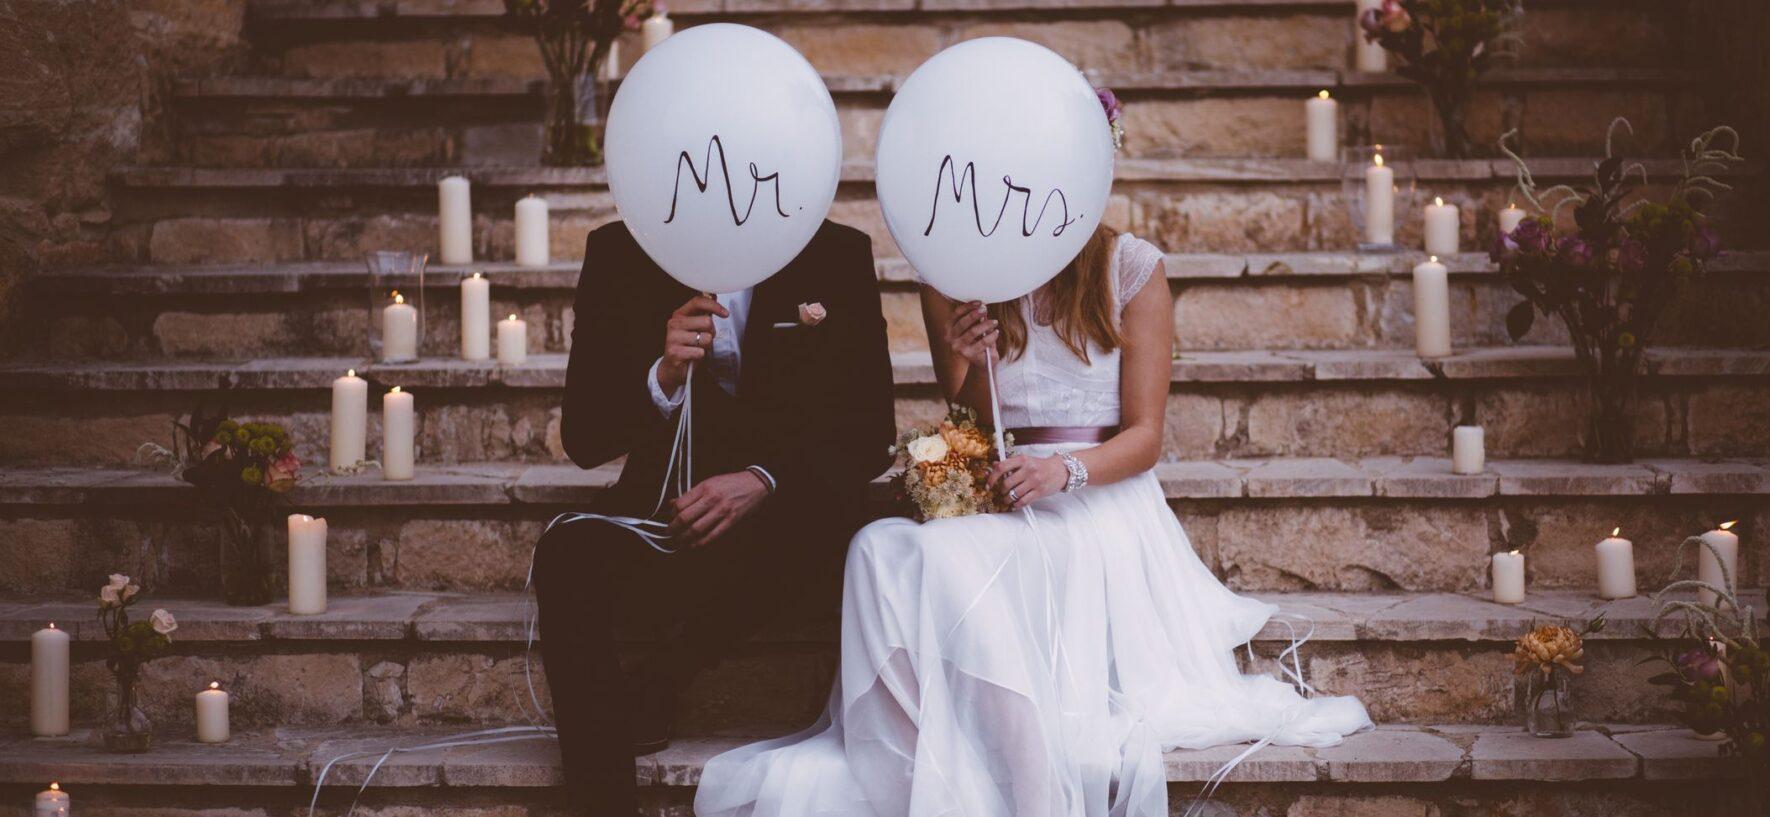 Nuove tendenze per i matrimoni 2021